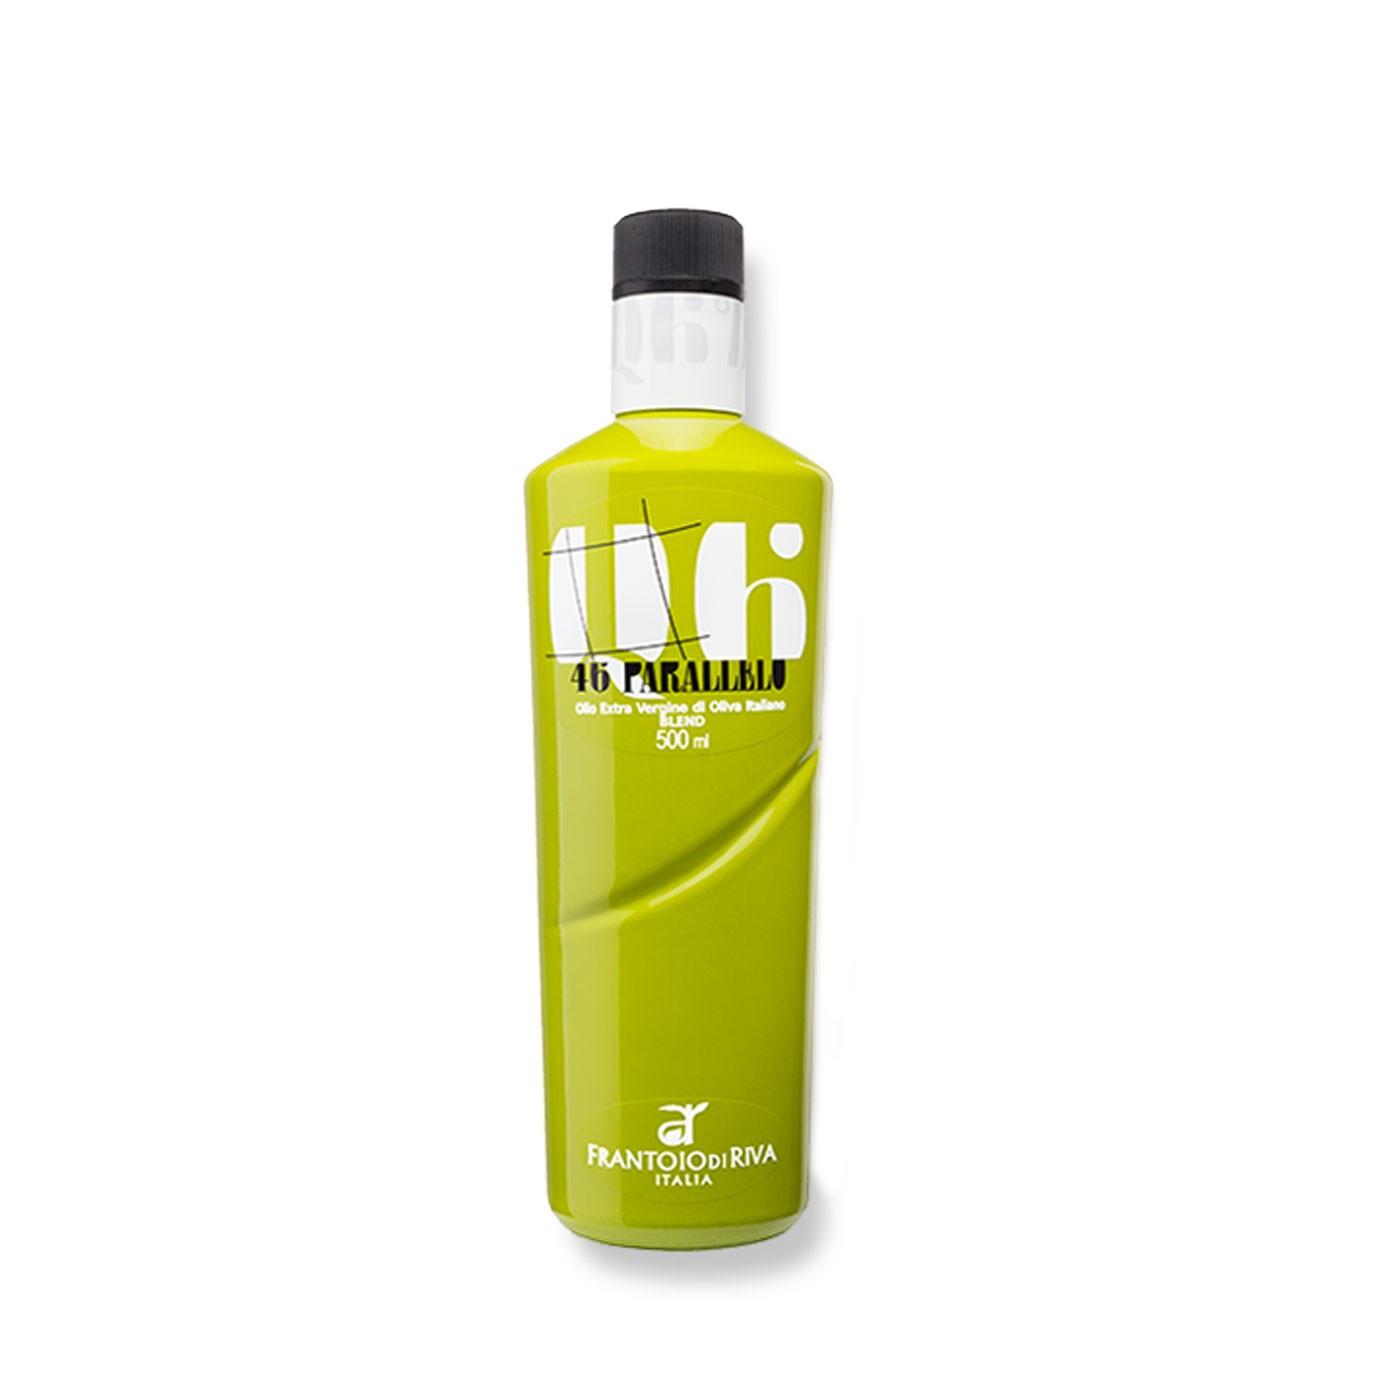 46° Parallelo Extra Virgin Olive Oil 16.9 oz - Frantoio di Riva